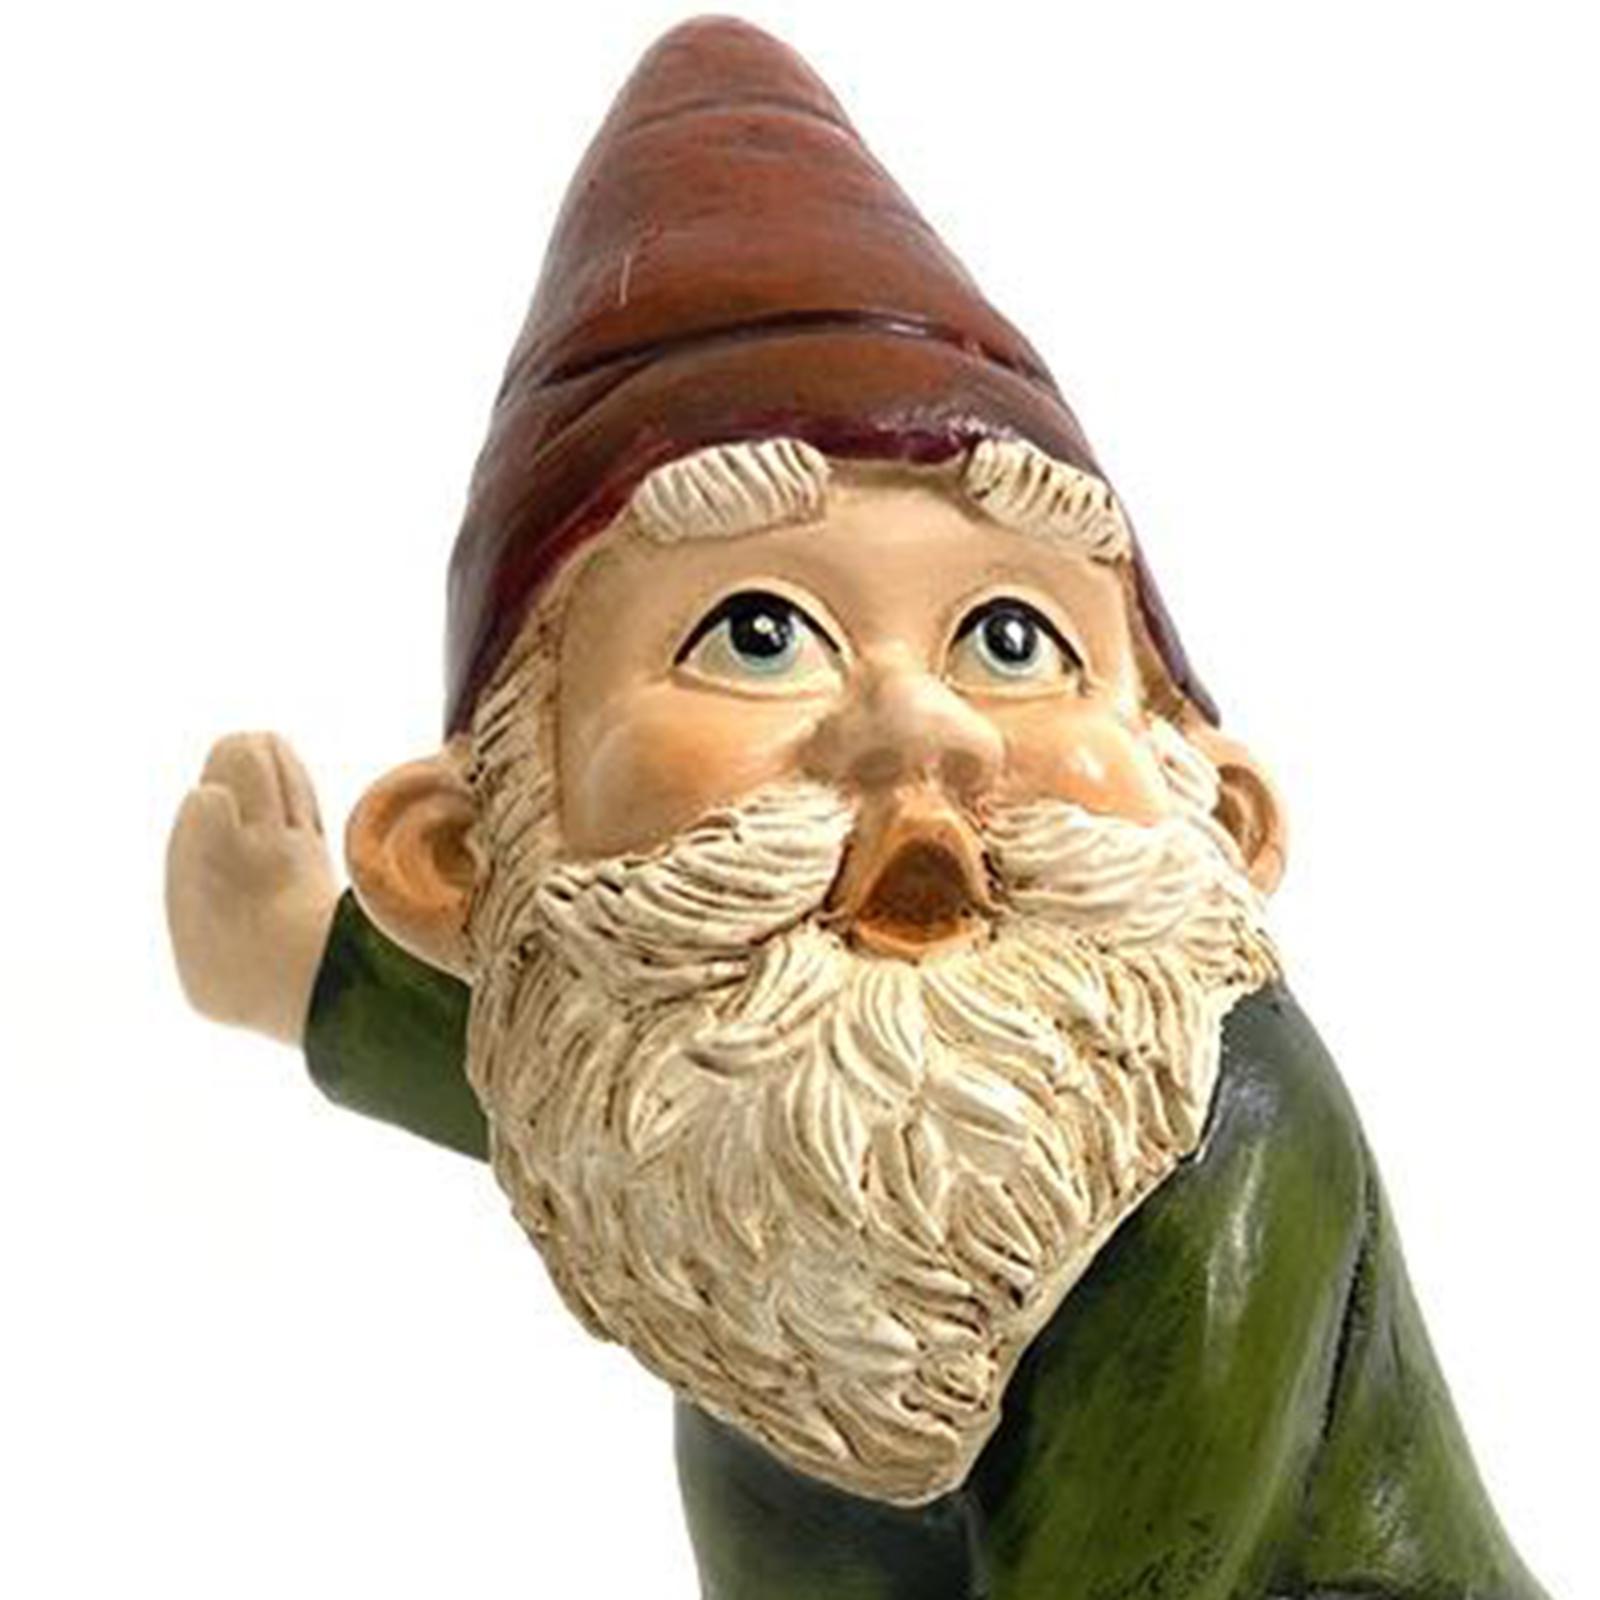 thumbnail 3 - Funny Resin Naughty Garden Gnome Statue Ornaments Outdoor Villa Home Figurines